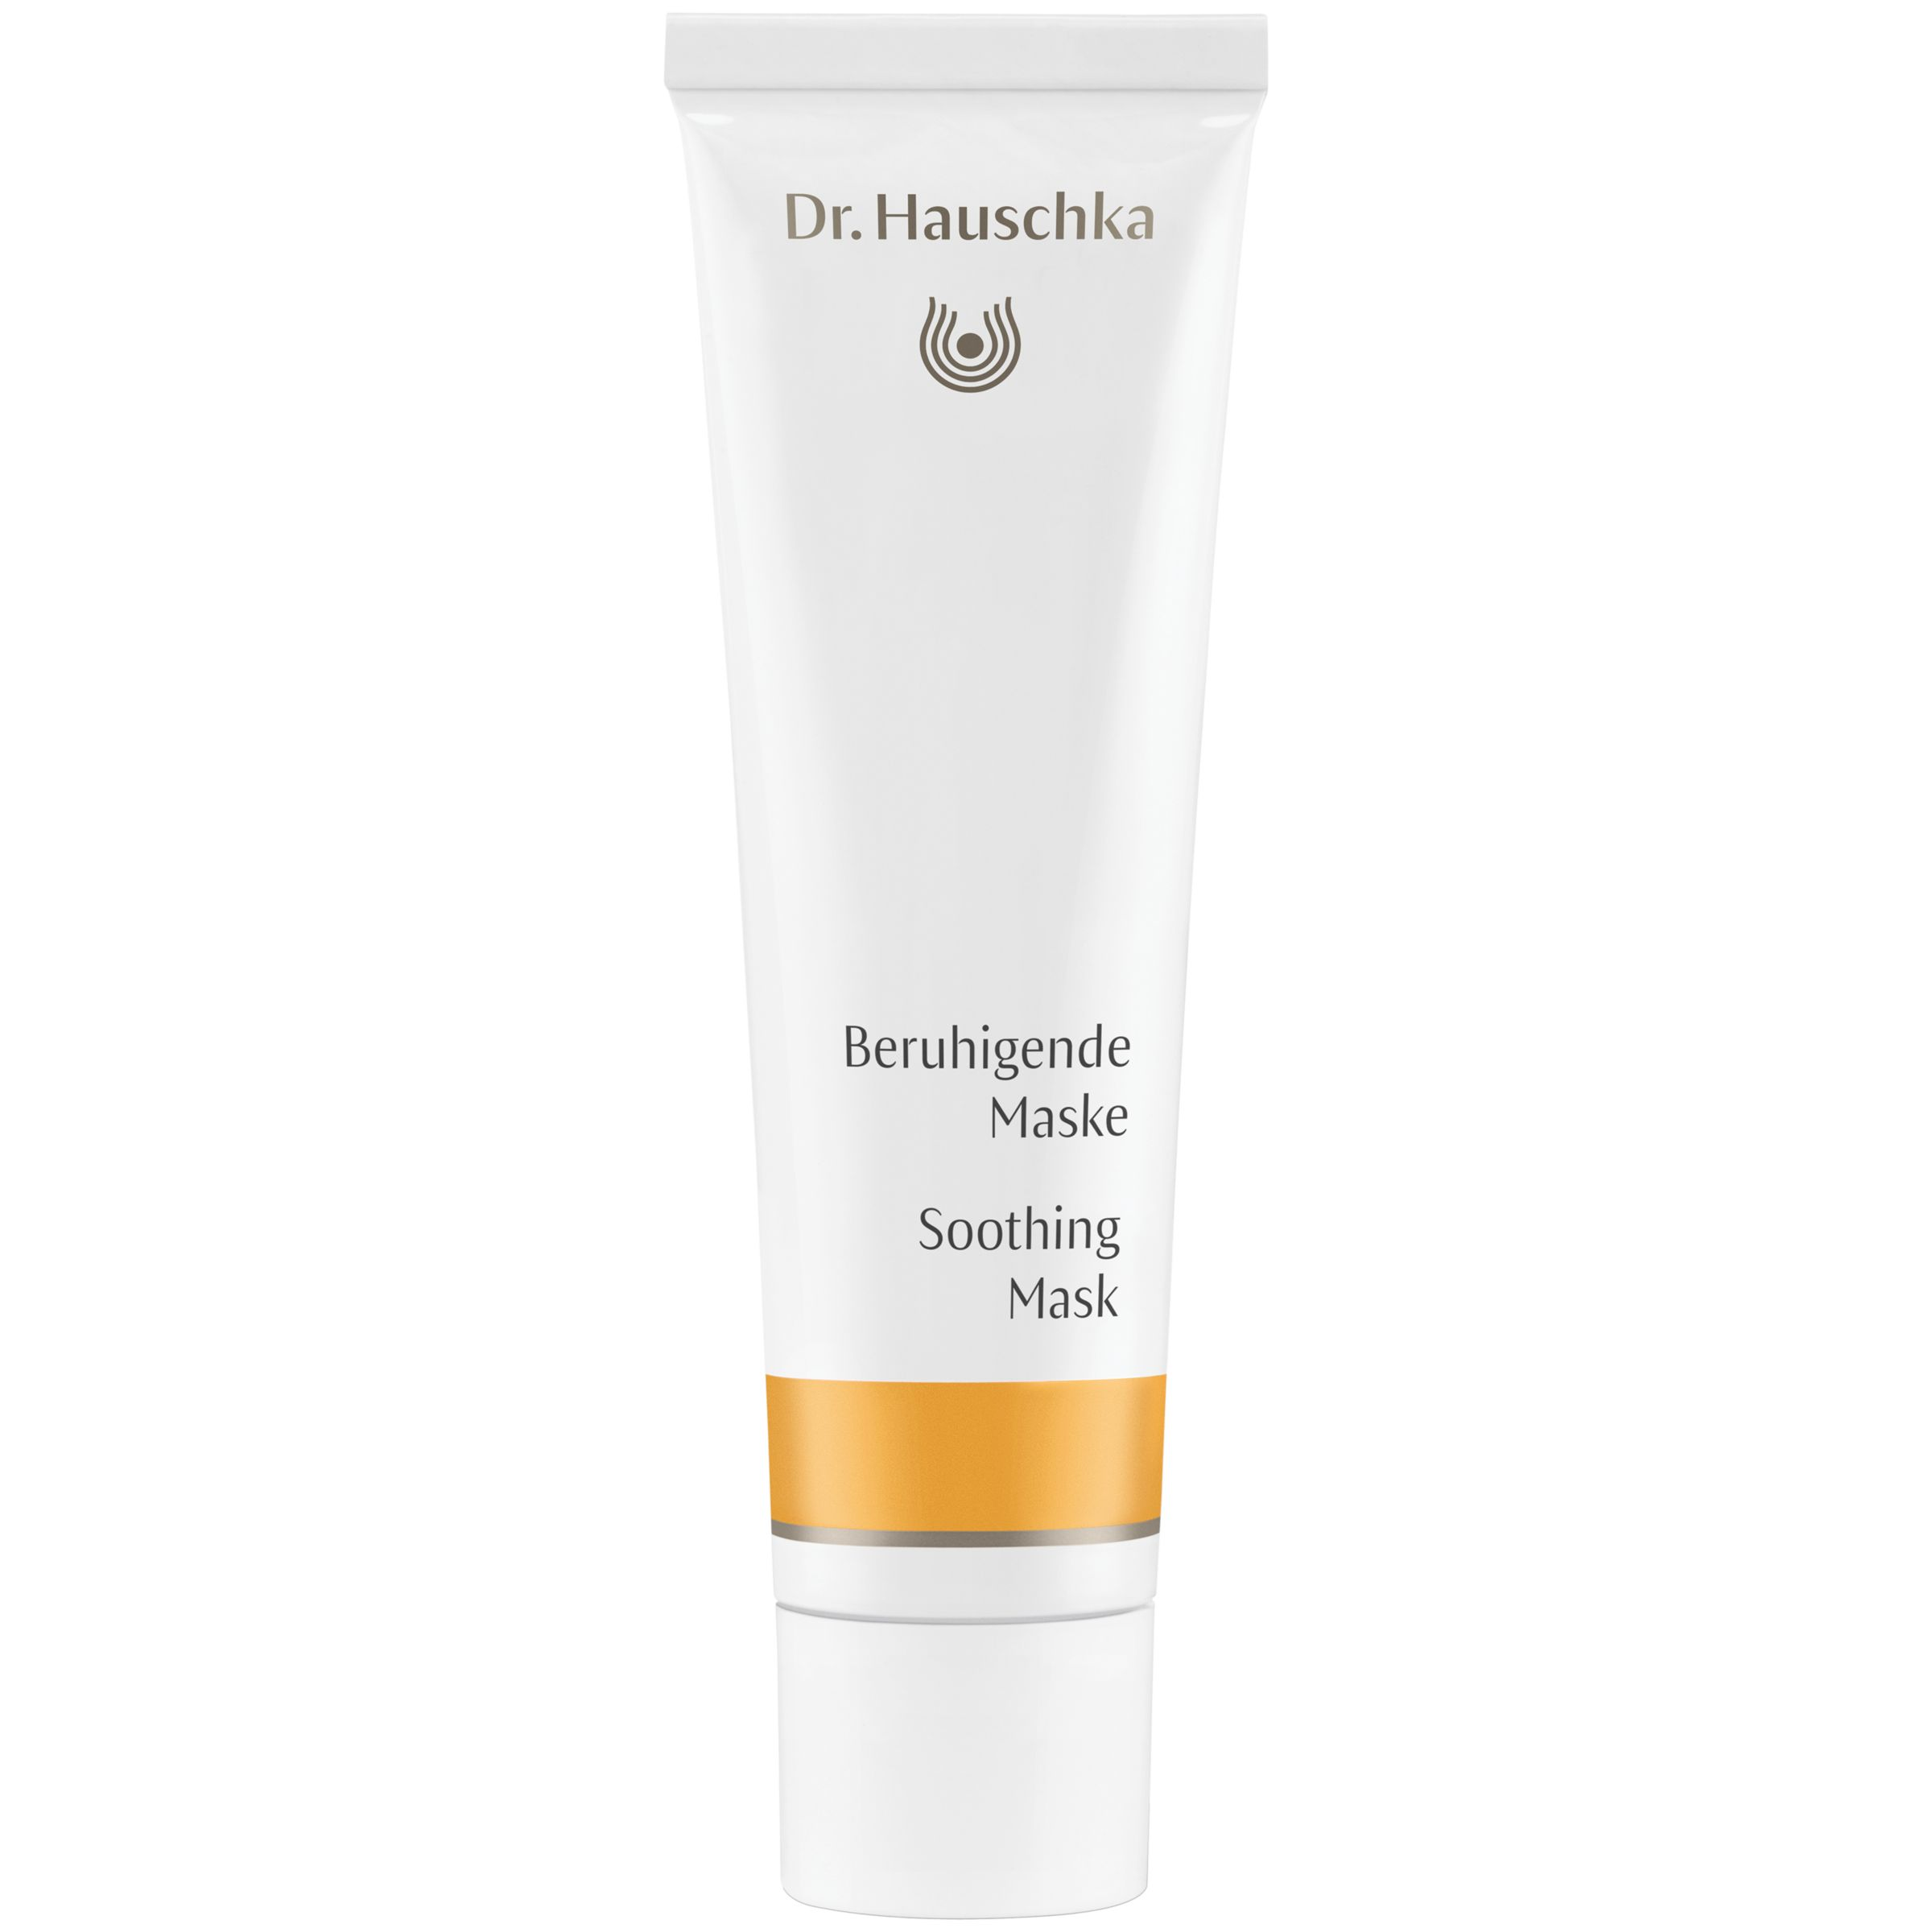 Dr Hauschka Dr Hauschka Soothing Mask, 30ml